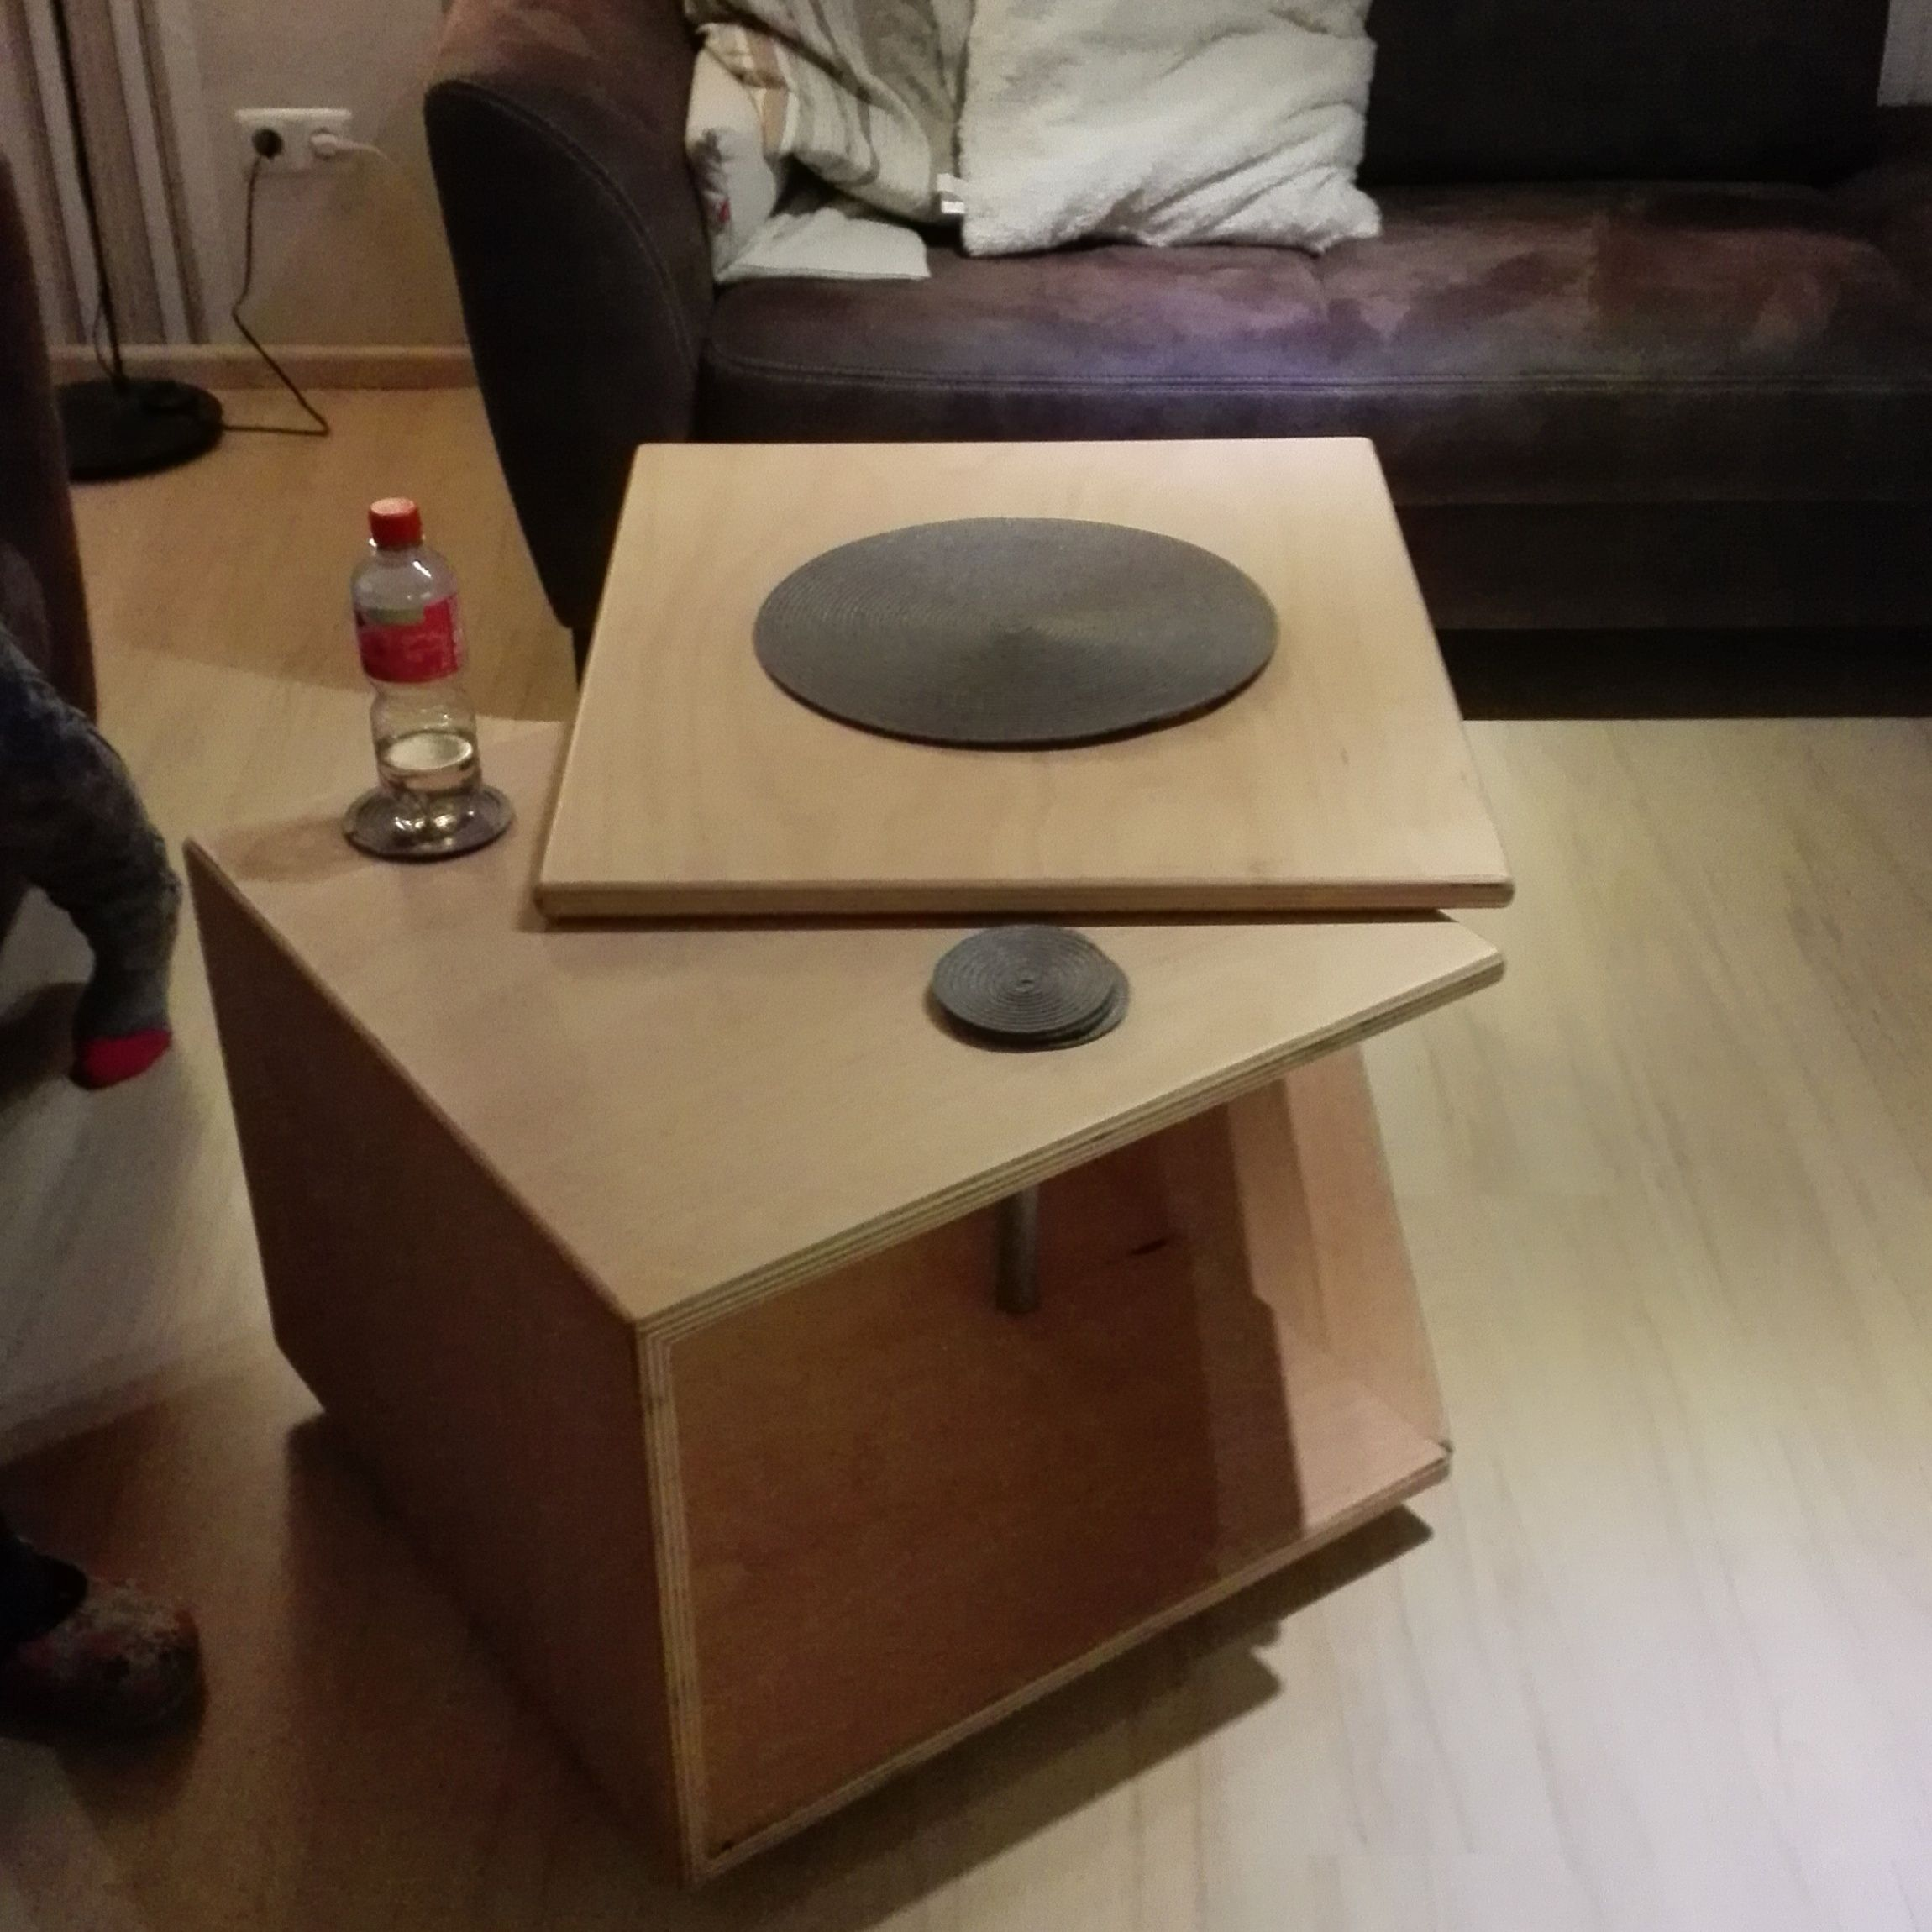 Wohnzimmertisch drehbar Bauanleitung zum selber bauen  Holzmbel  Pinterest  Tisch Holzmbel